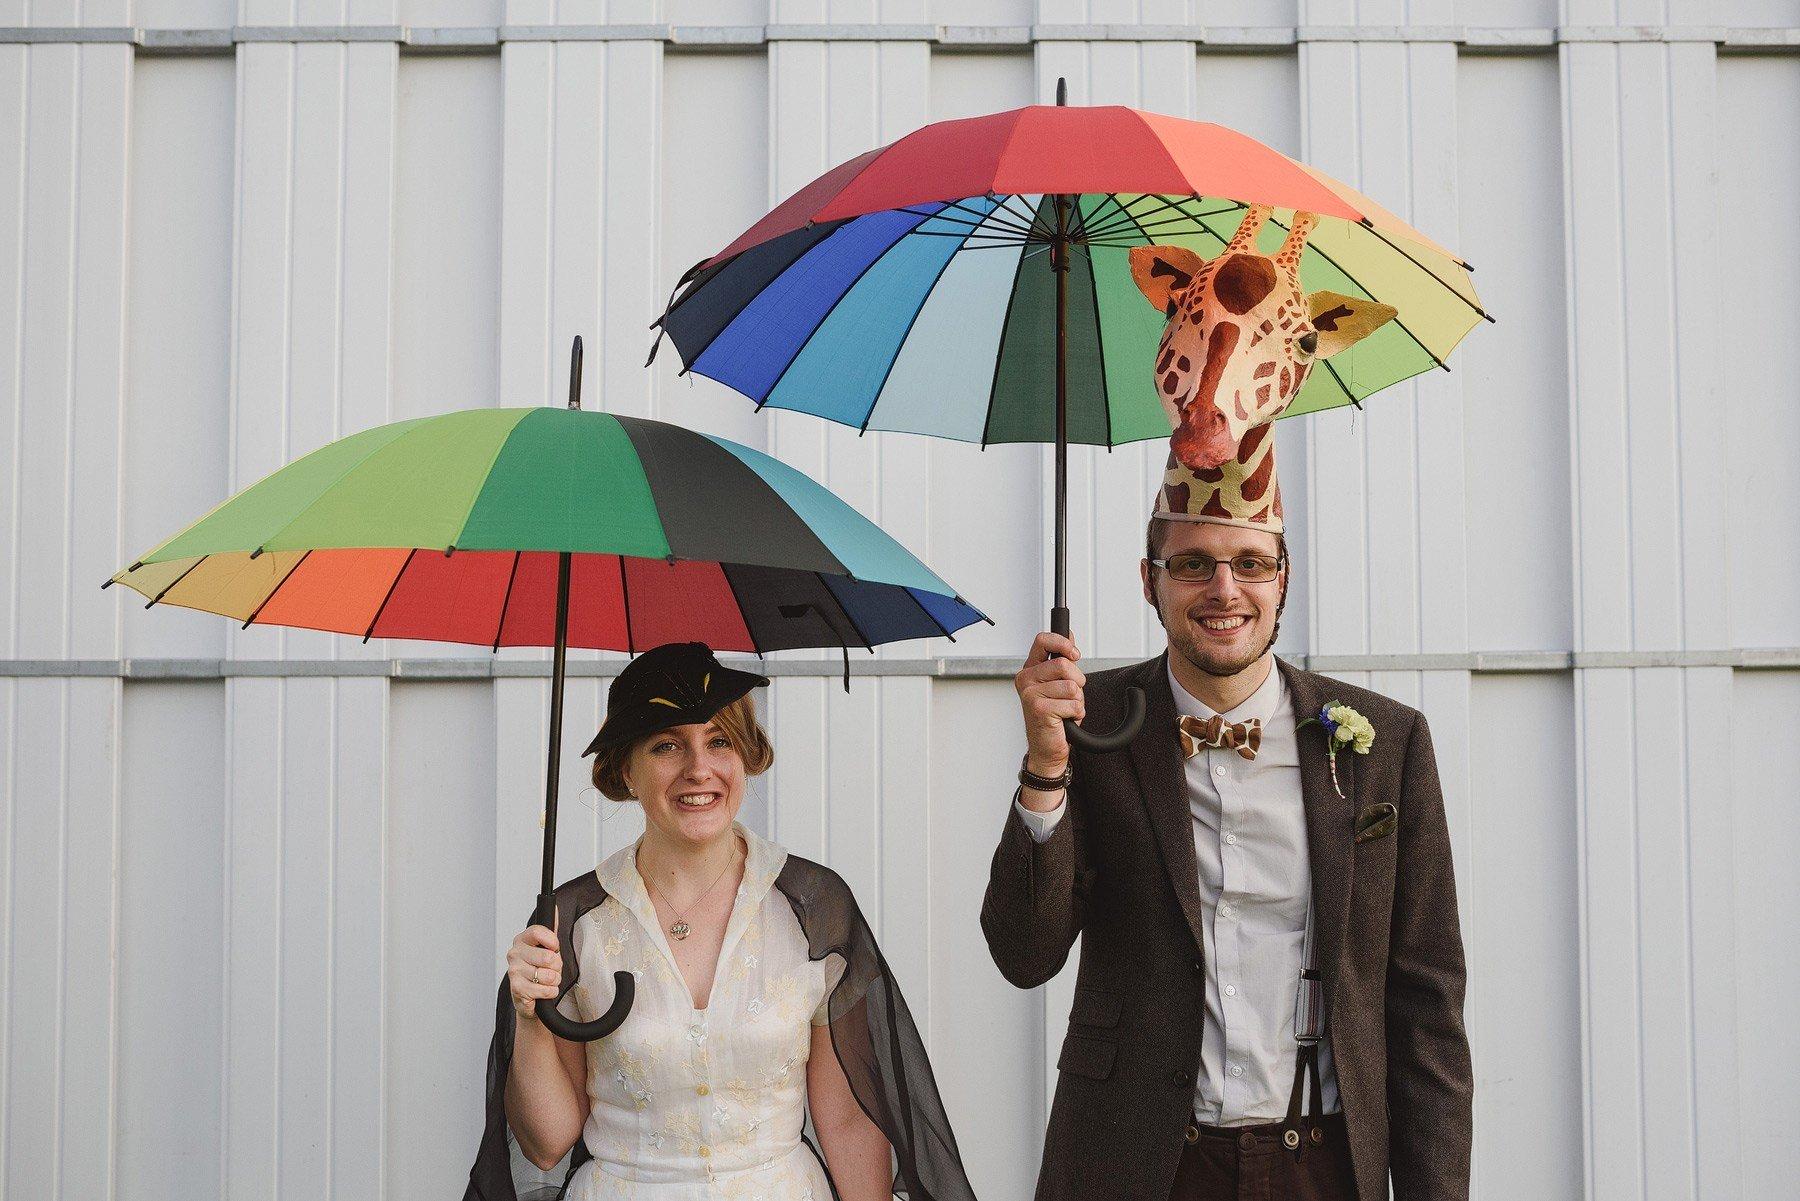 alternative portraits at a wedding using rainbow umbrellas